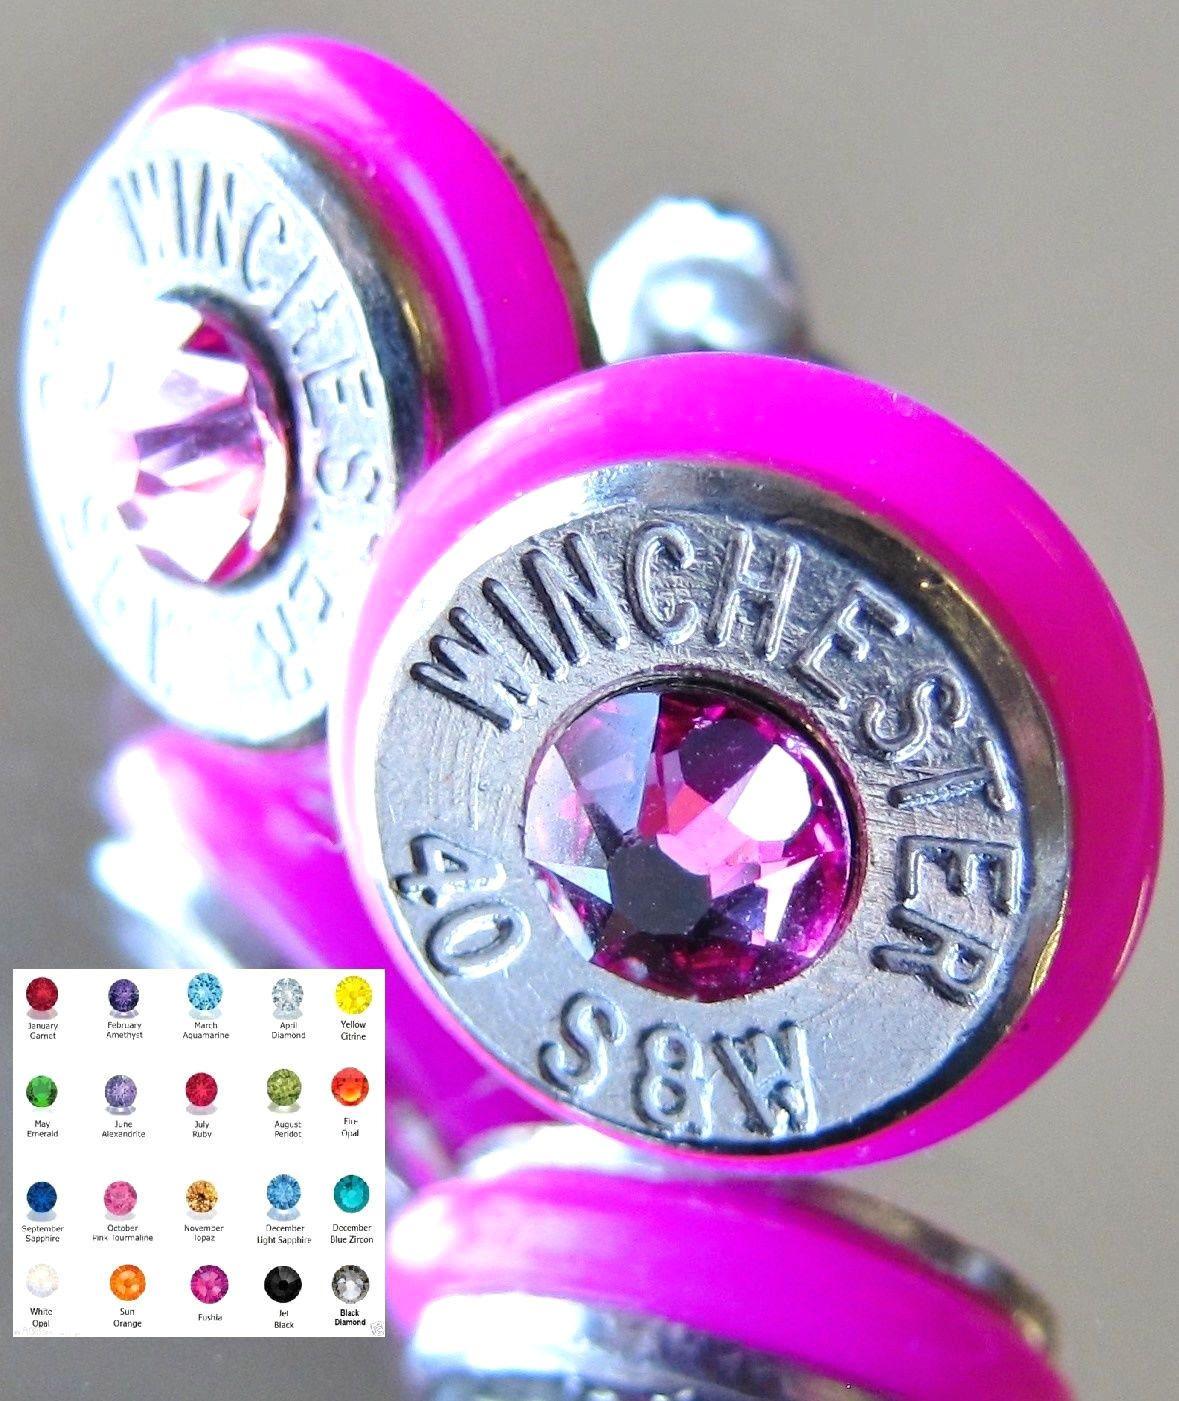 Blue camo wedding dresses   SuW Winchester Bullet Earrings Choice Swarovski Crystal Silver